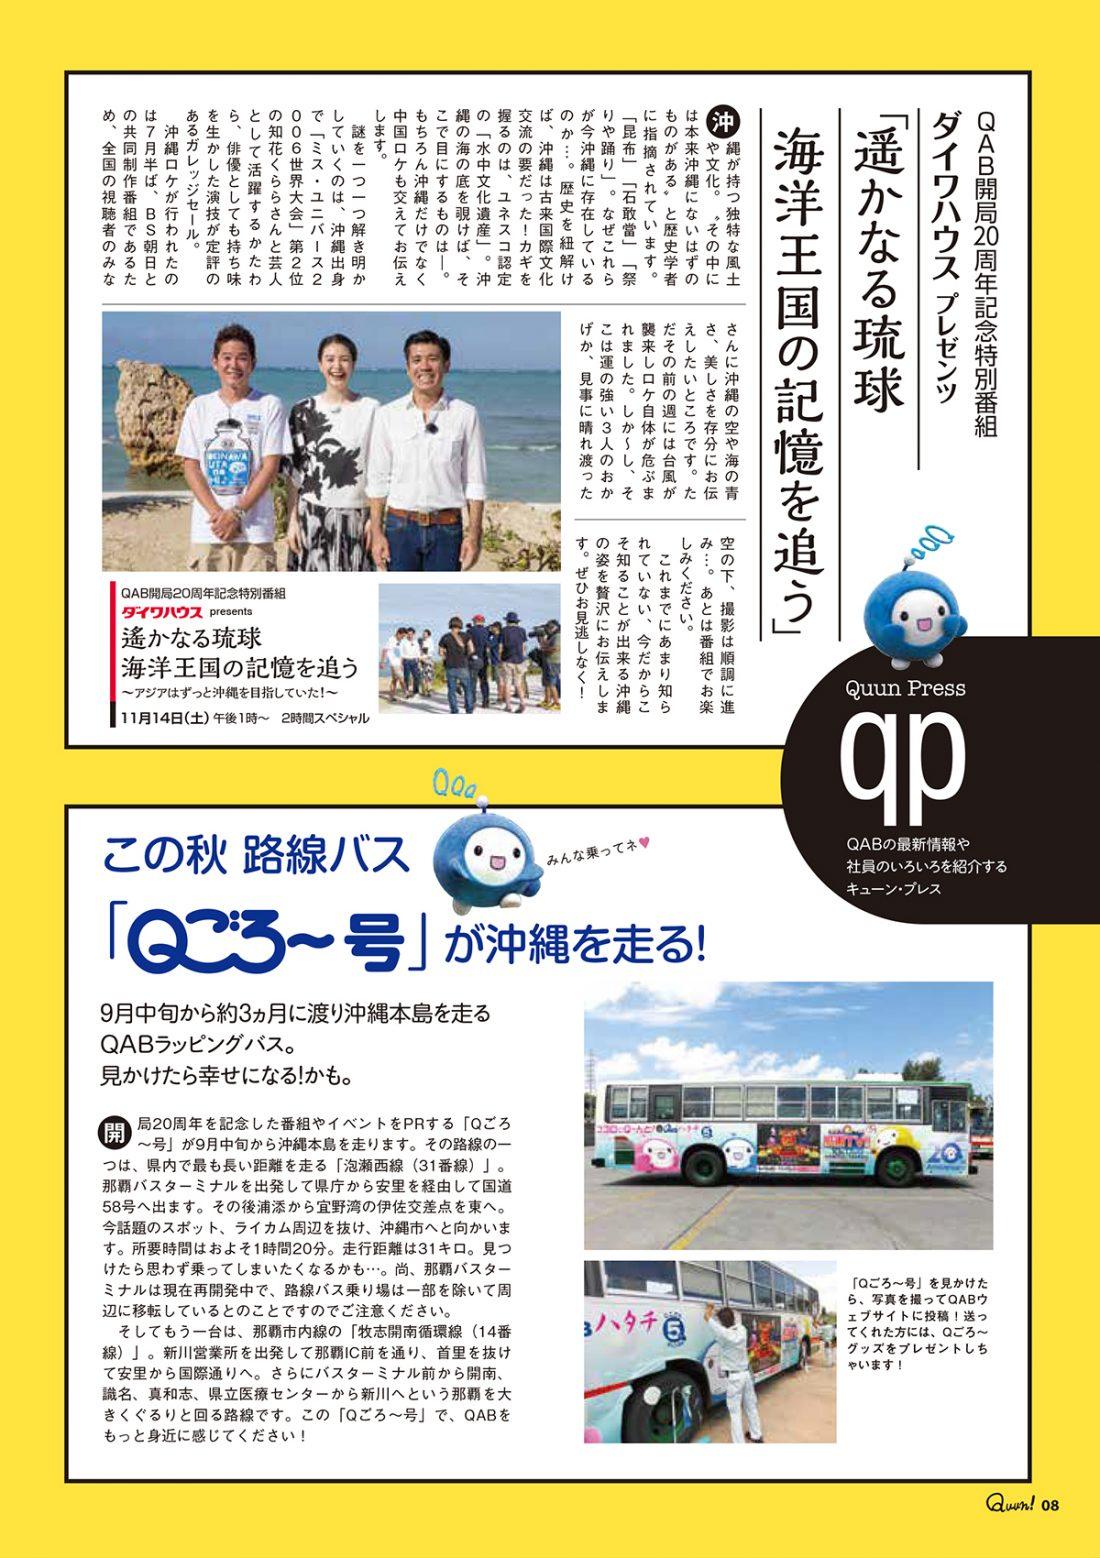 http://www.qab.co.jp/qgoro/wp-content/uploads/quun_0410-1100x1558.jpg